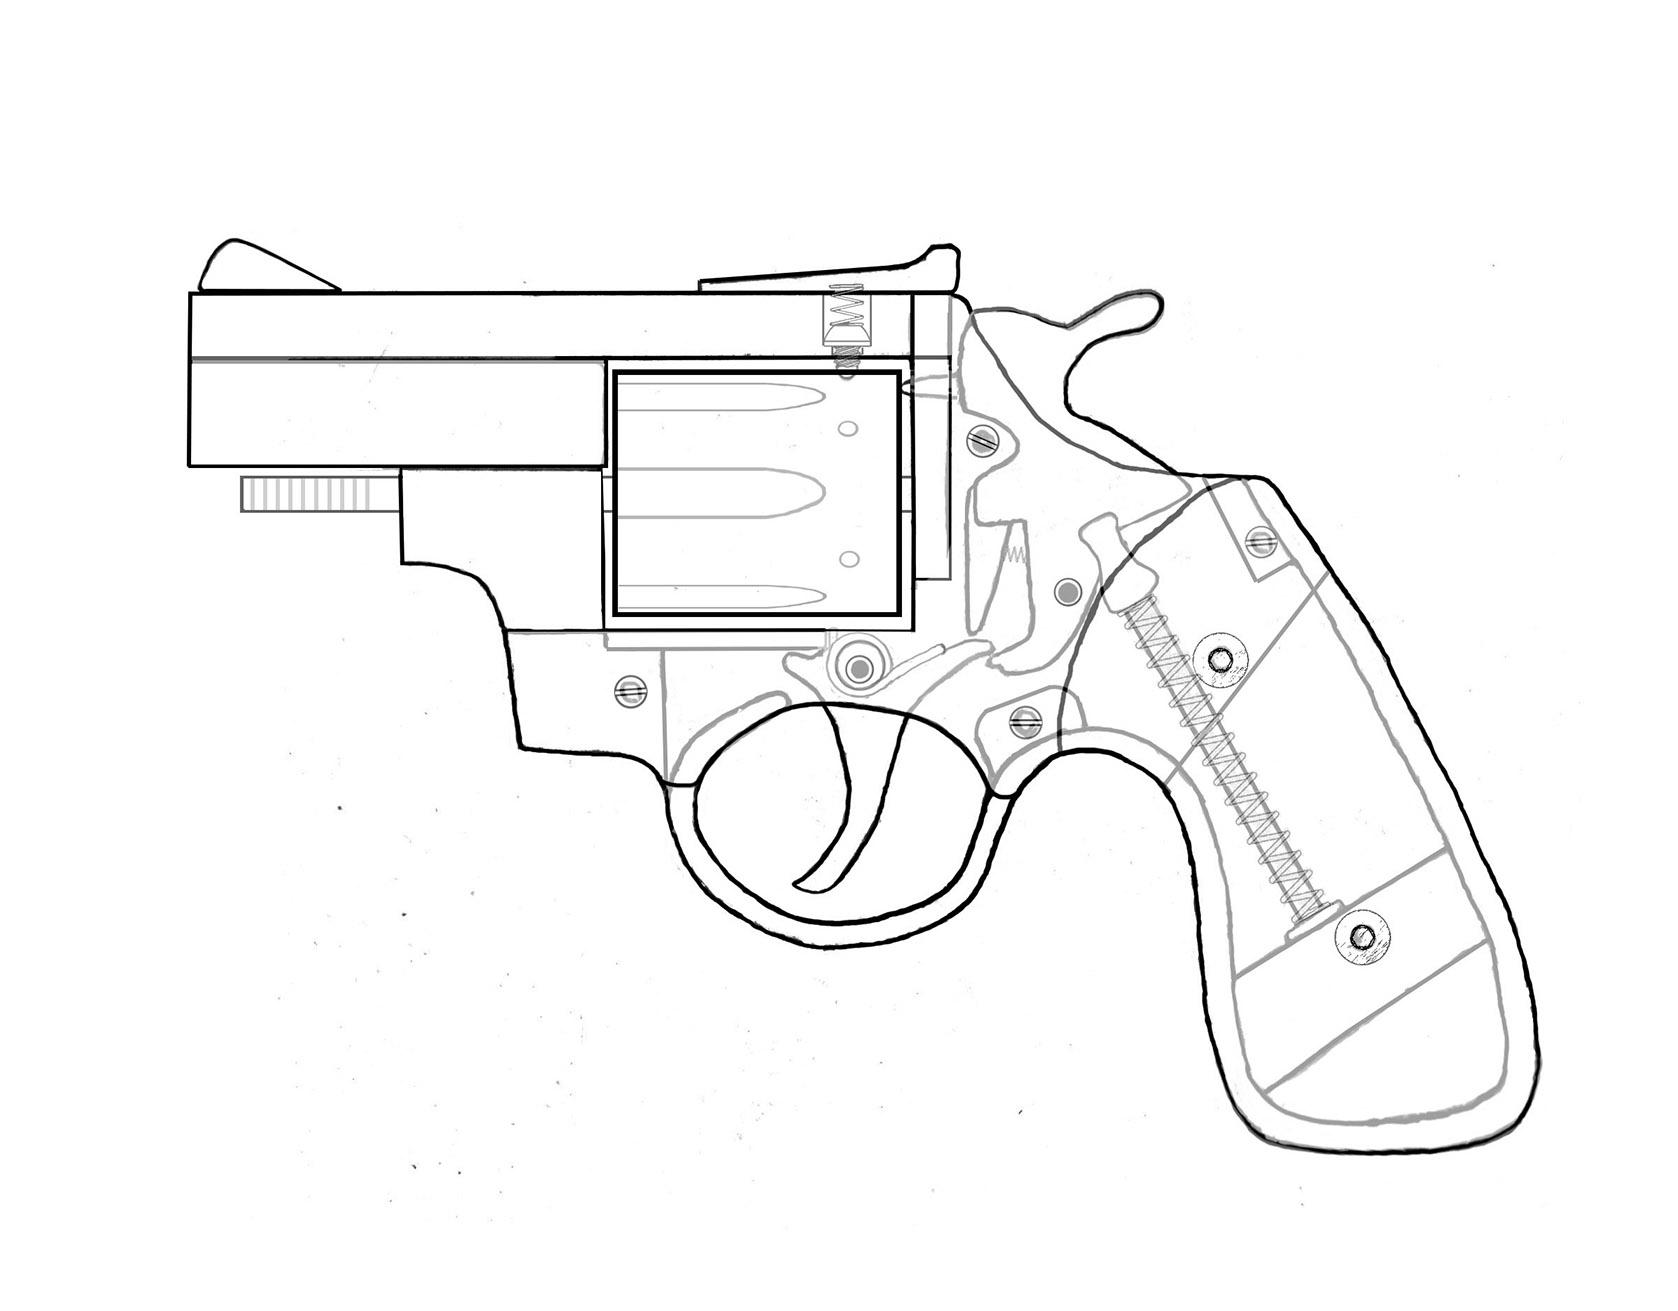 Hand Gun Drawing At Getdrawings